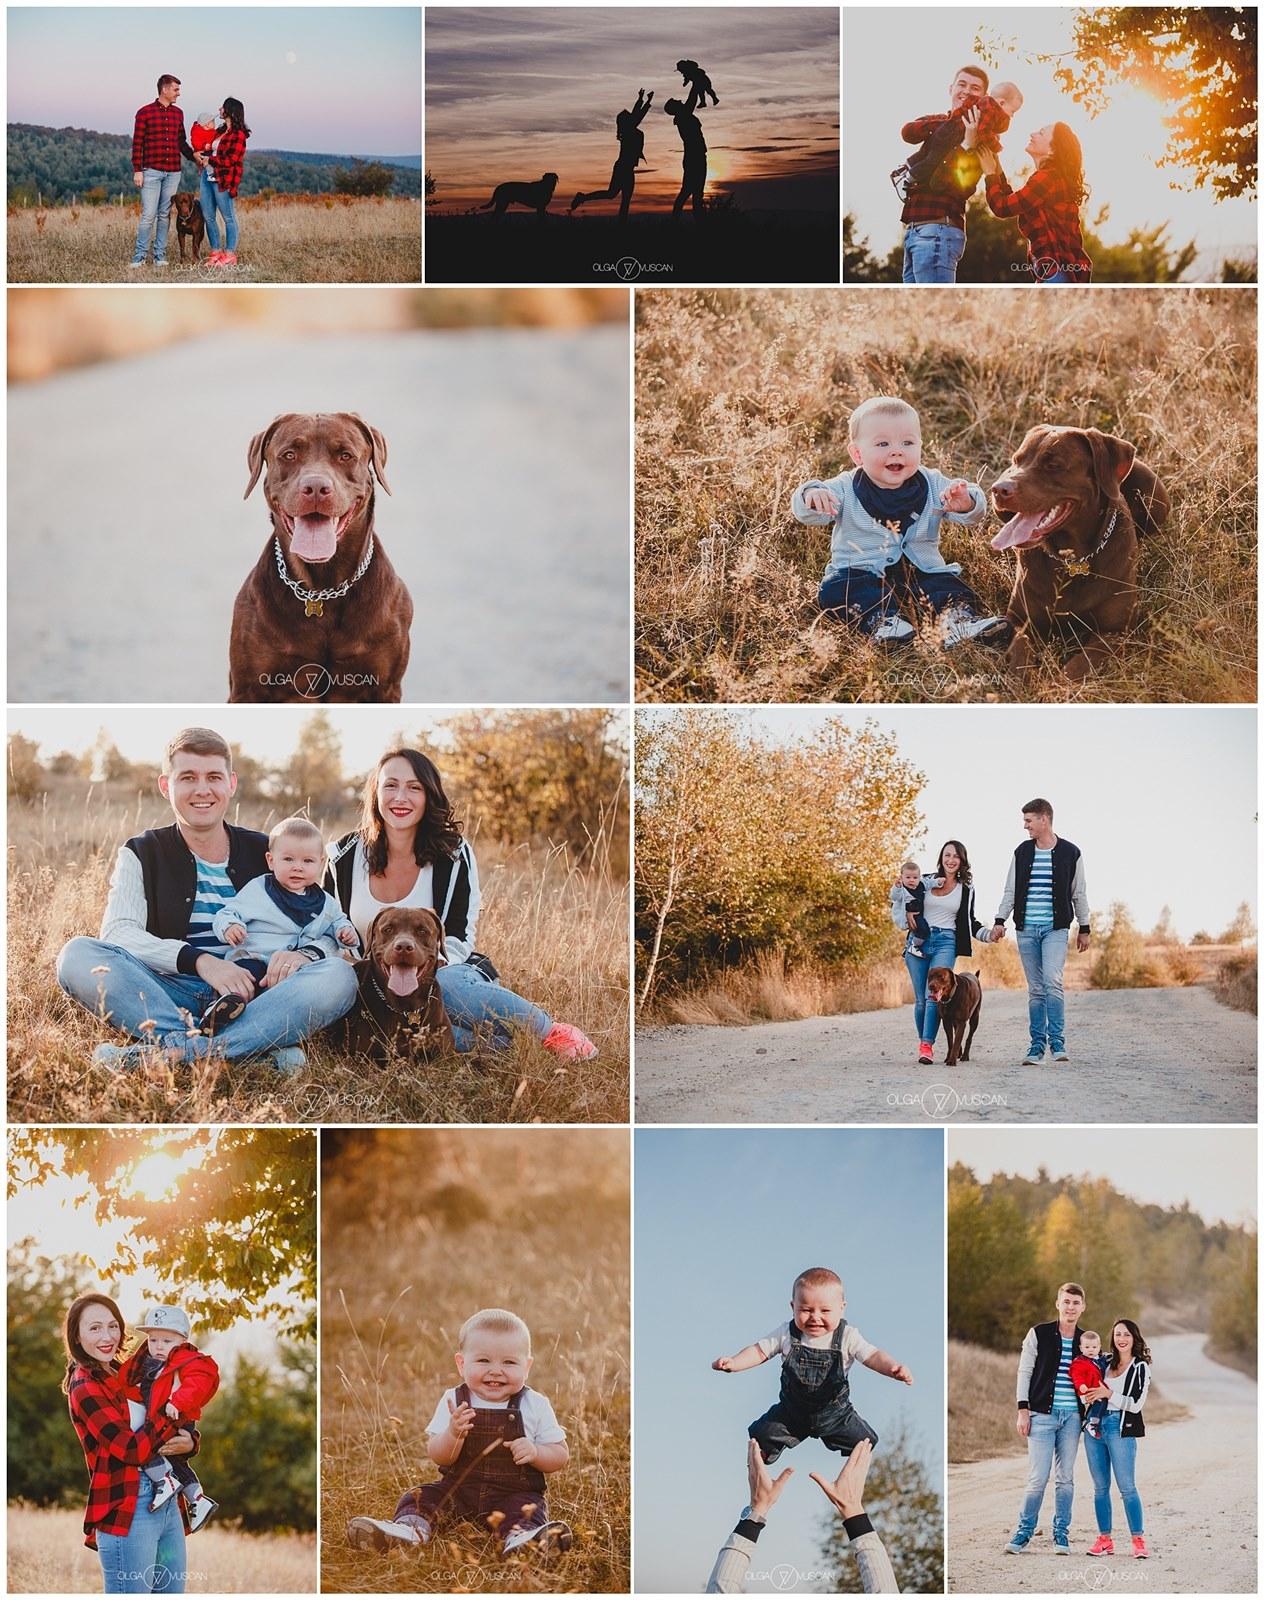 sedinta foto copii 10 luni, fotograf copii Cluj, sesiune foto afara, fotograf profesionist copii